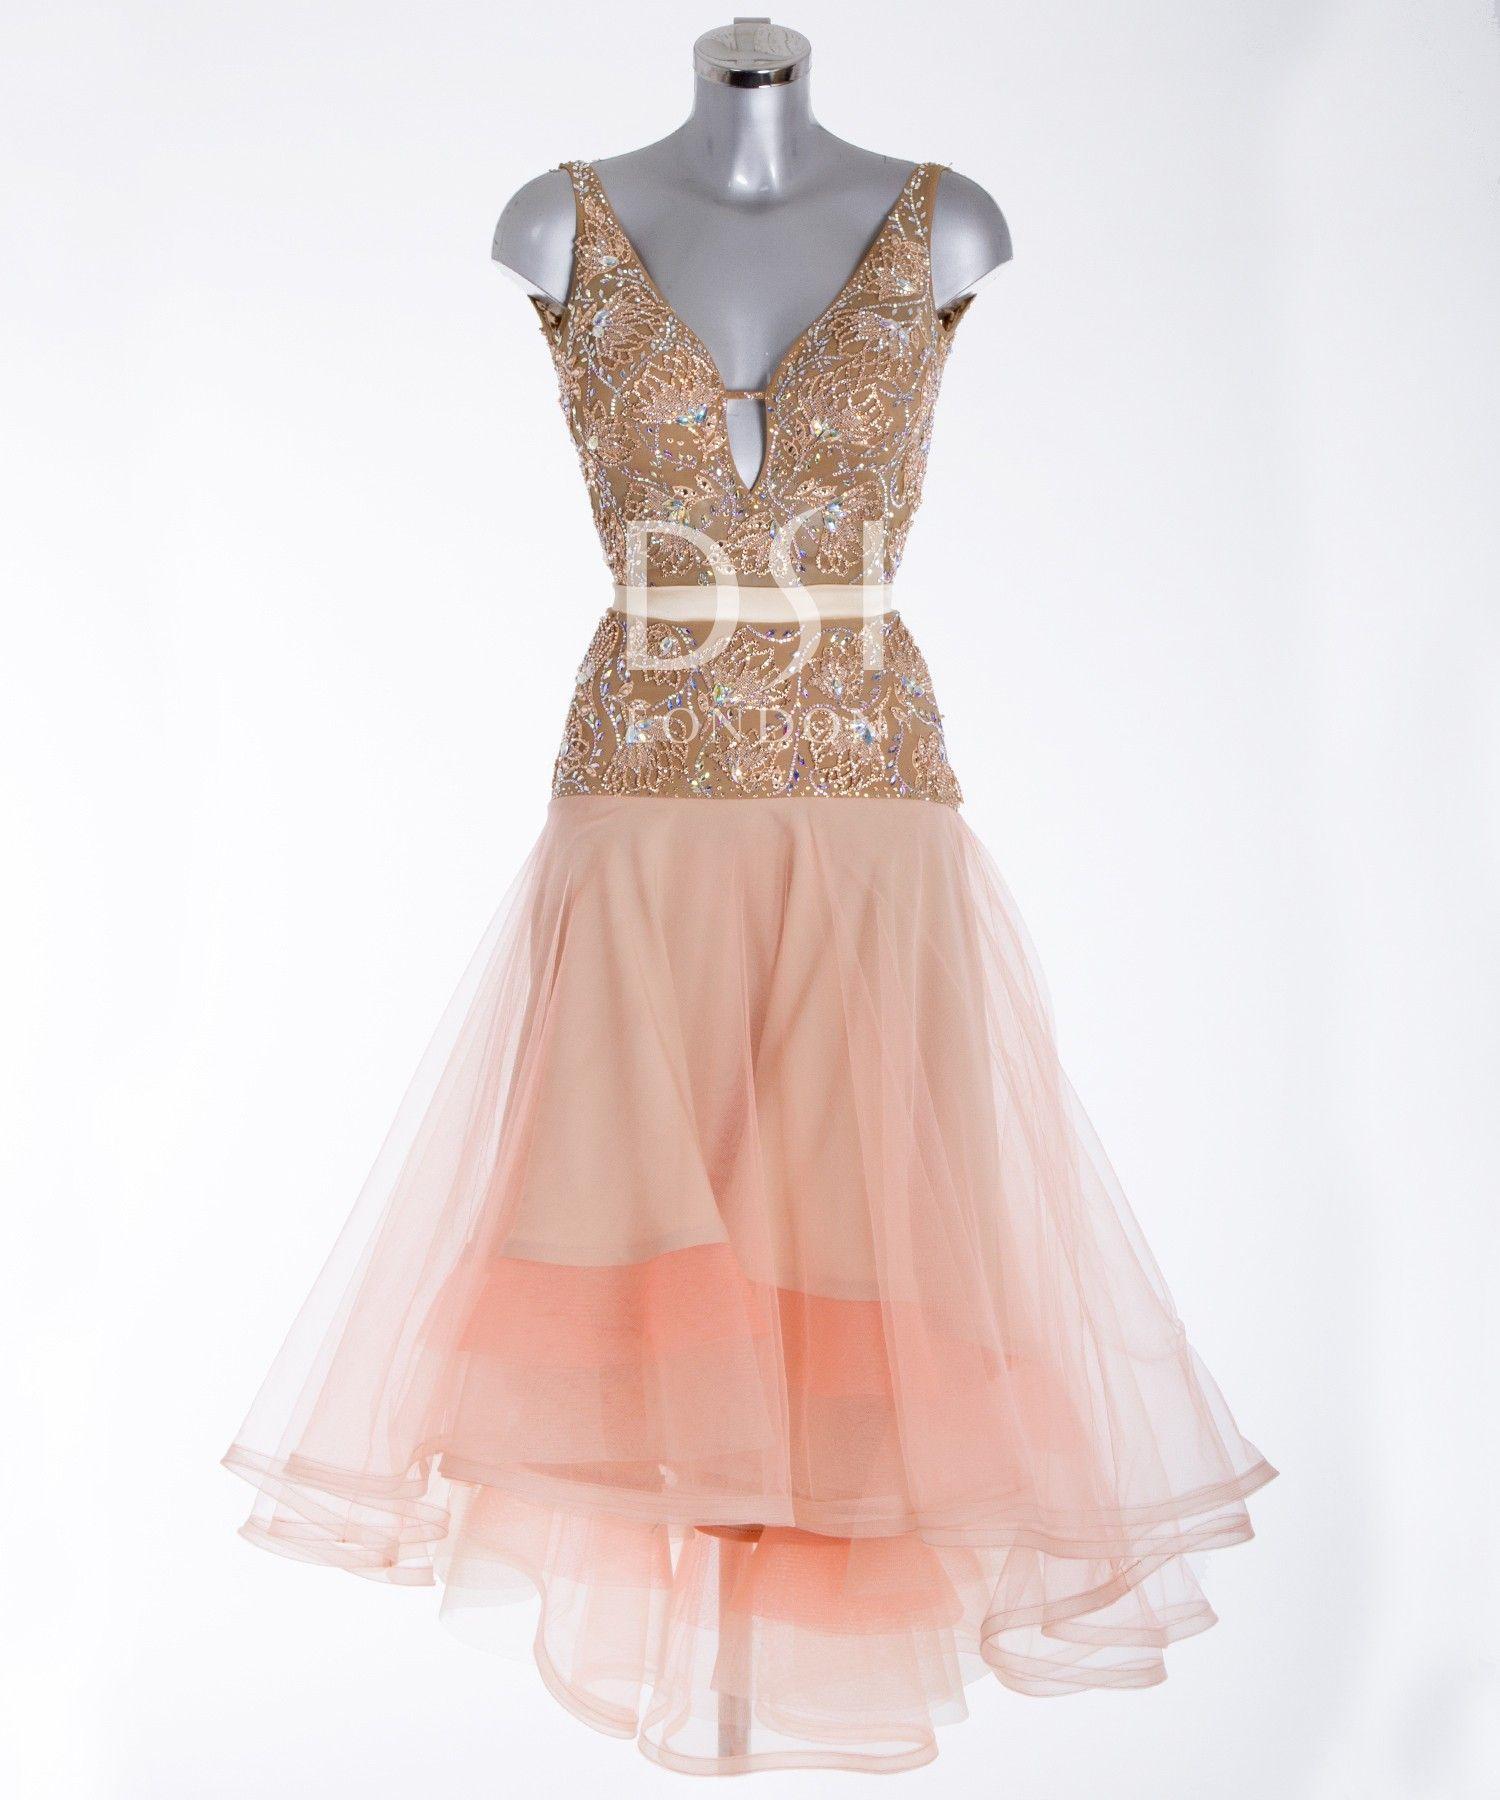 392197 Coral Latin Dress | Latin dresses for sale | Dance ...